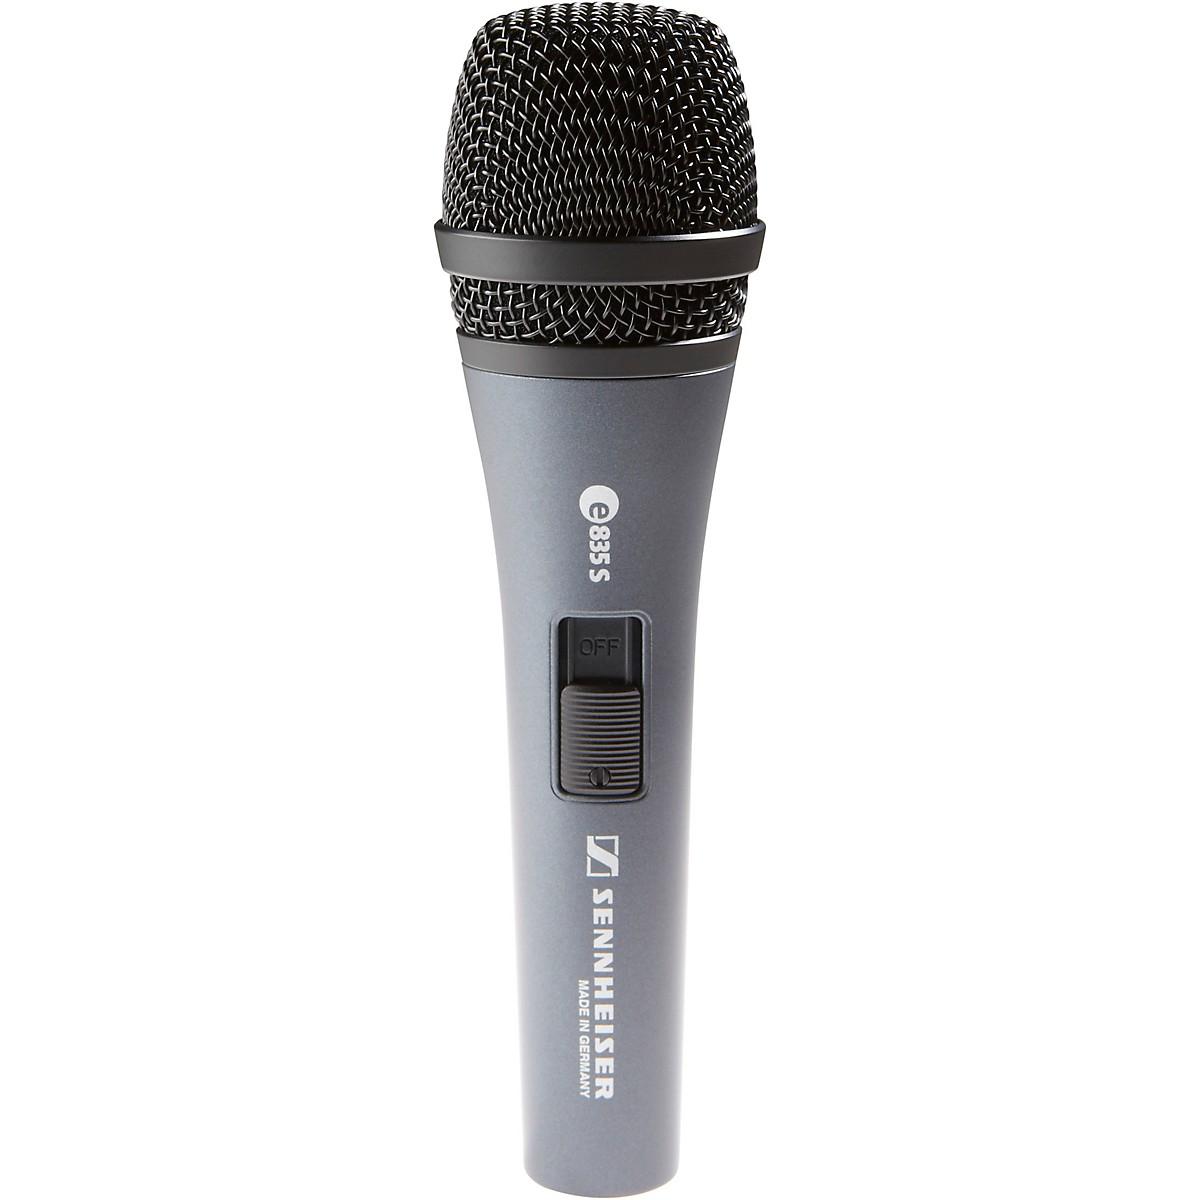 Sennheiser e 835-S Performance Vocal Microphone